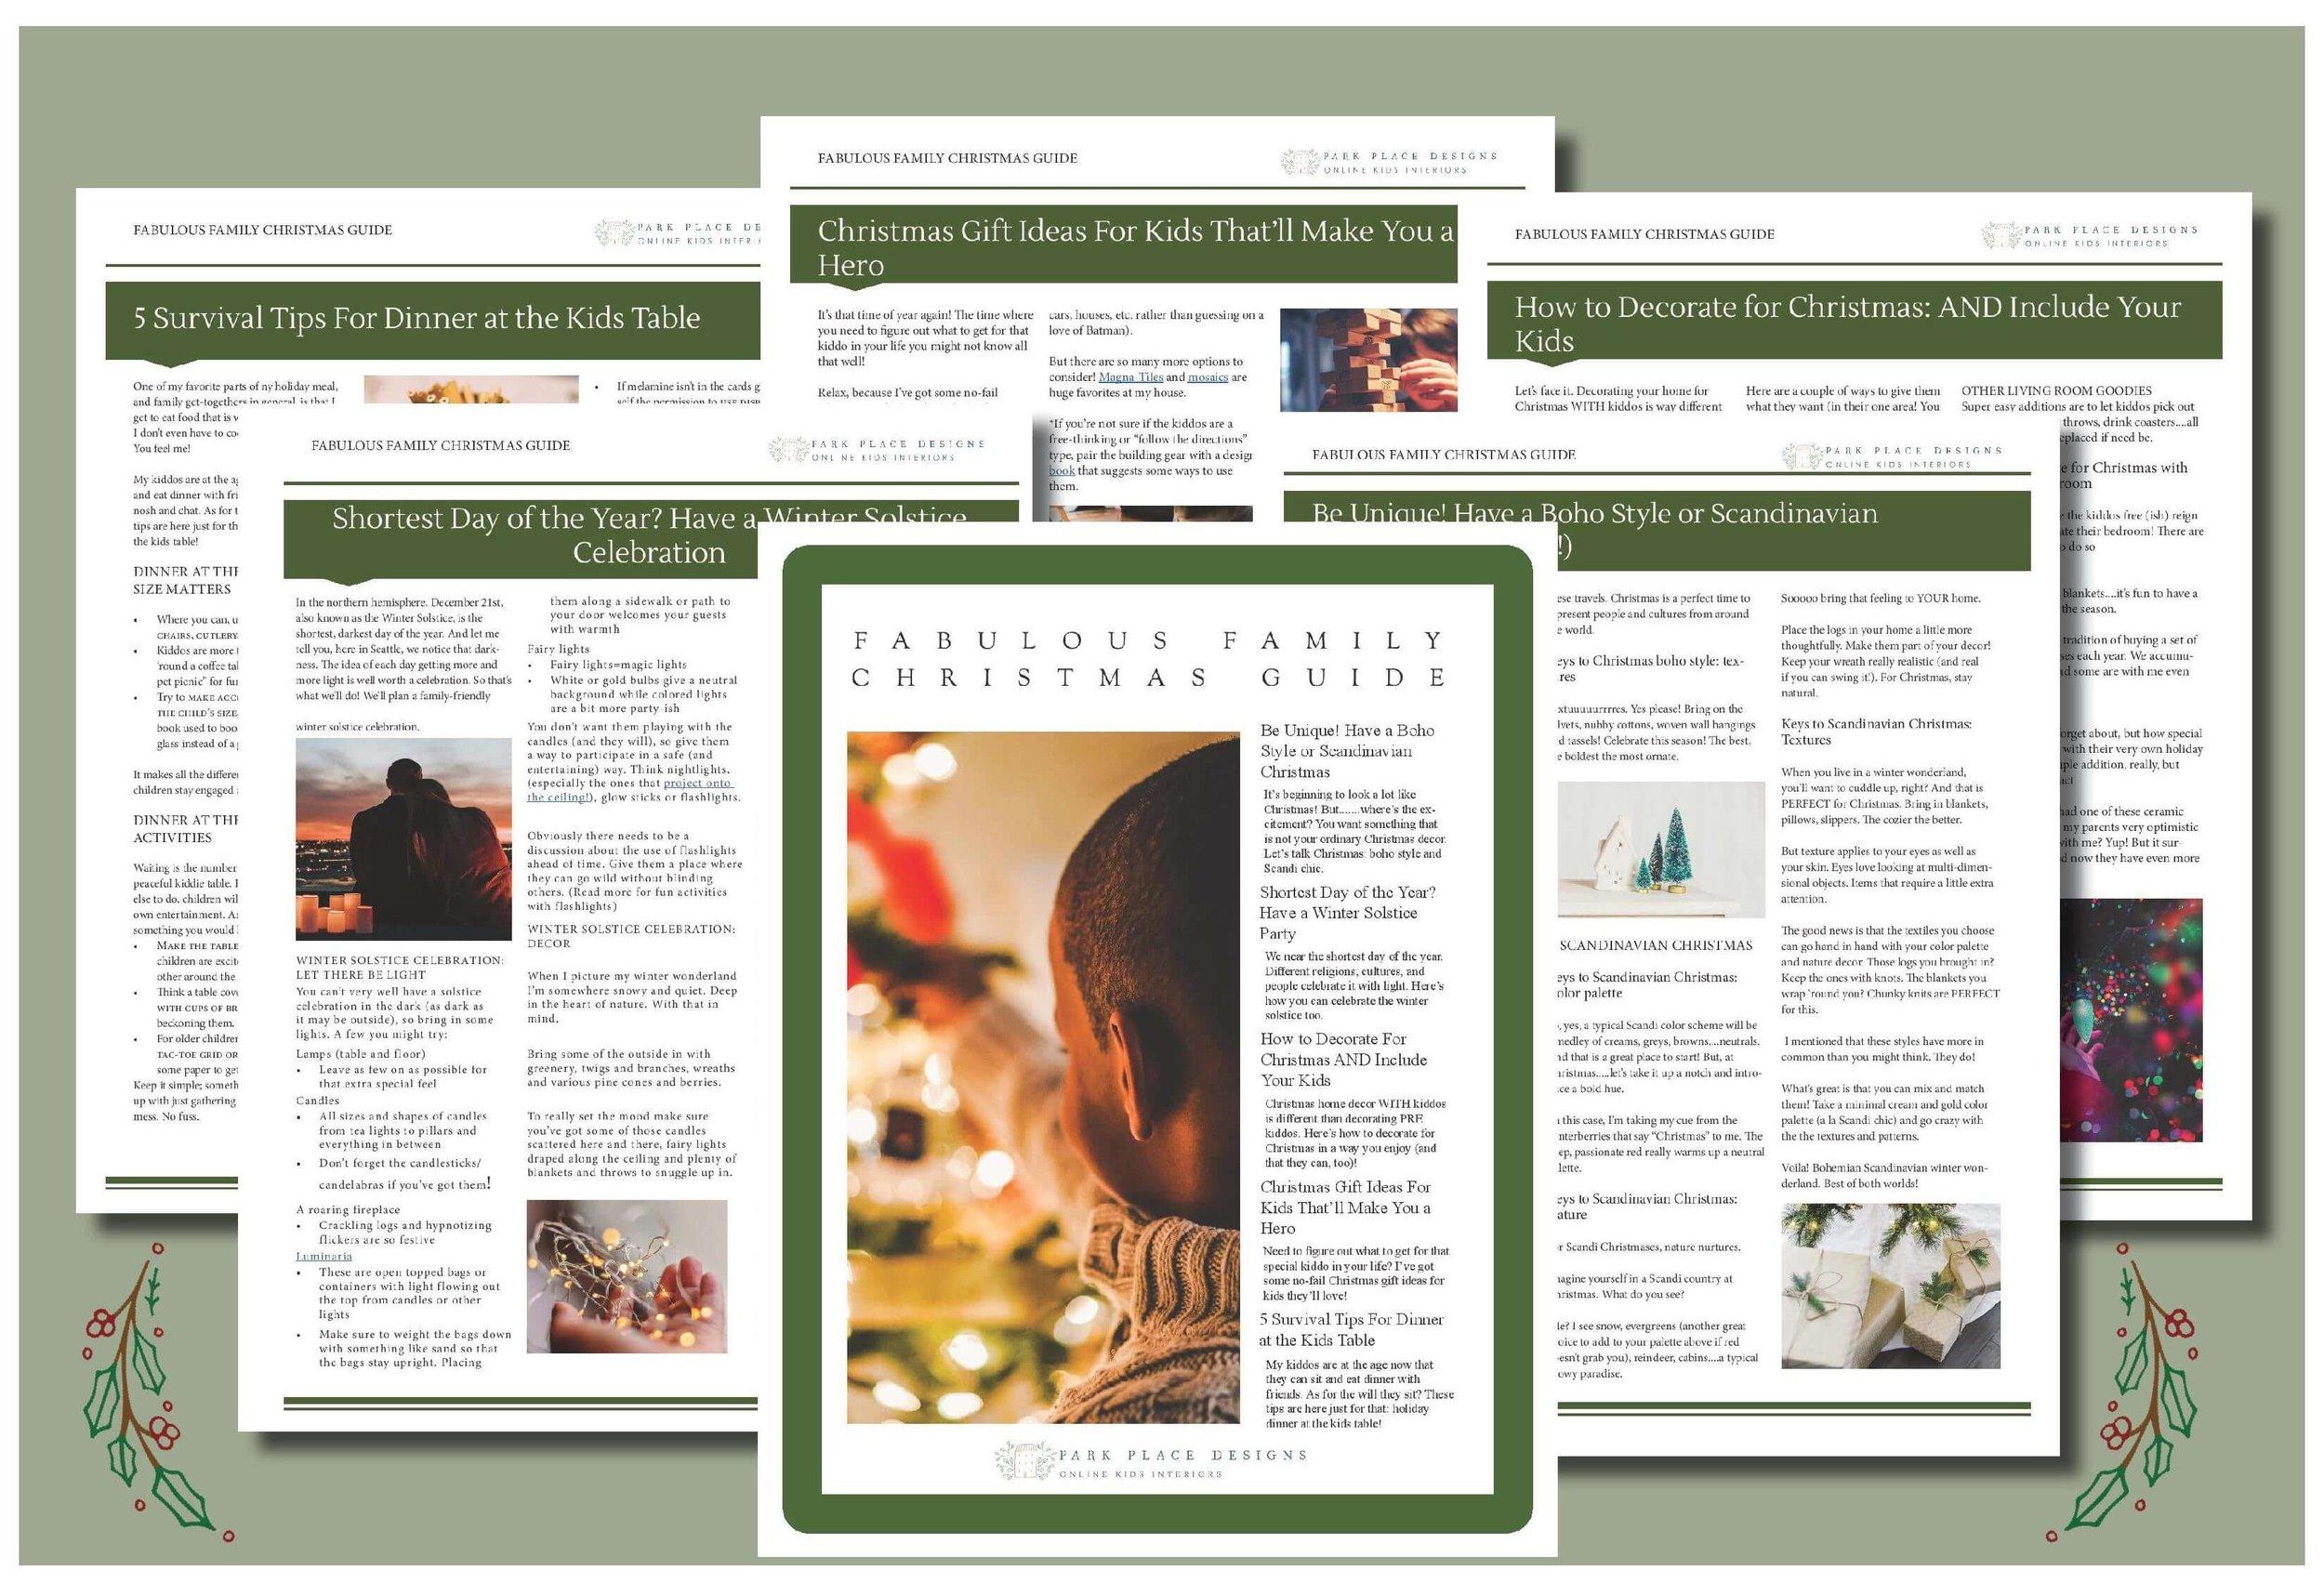 fabulous family christmas guide online kids interiors jen pollard park place designs.jpg